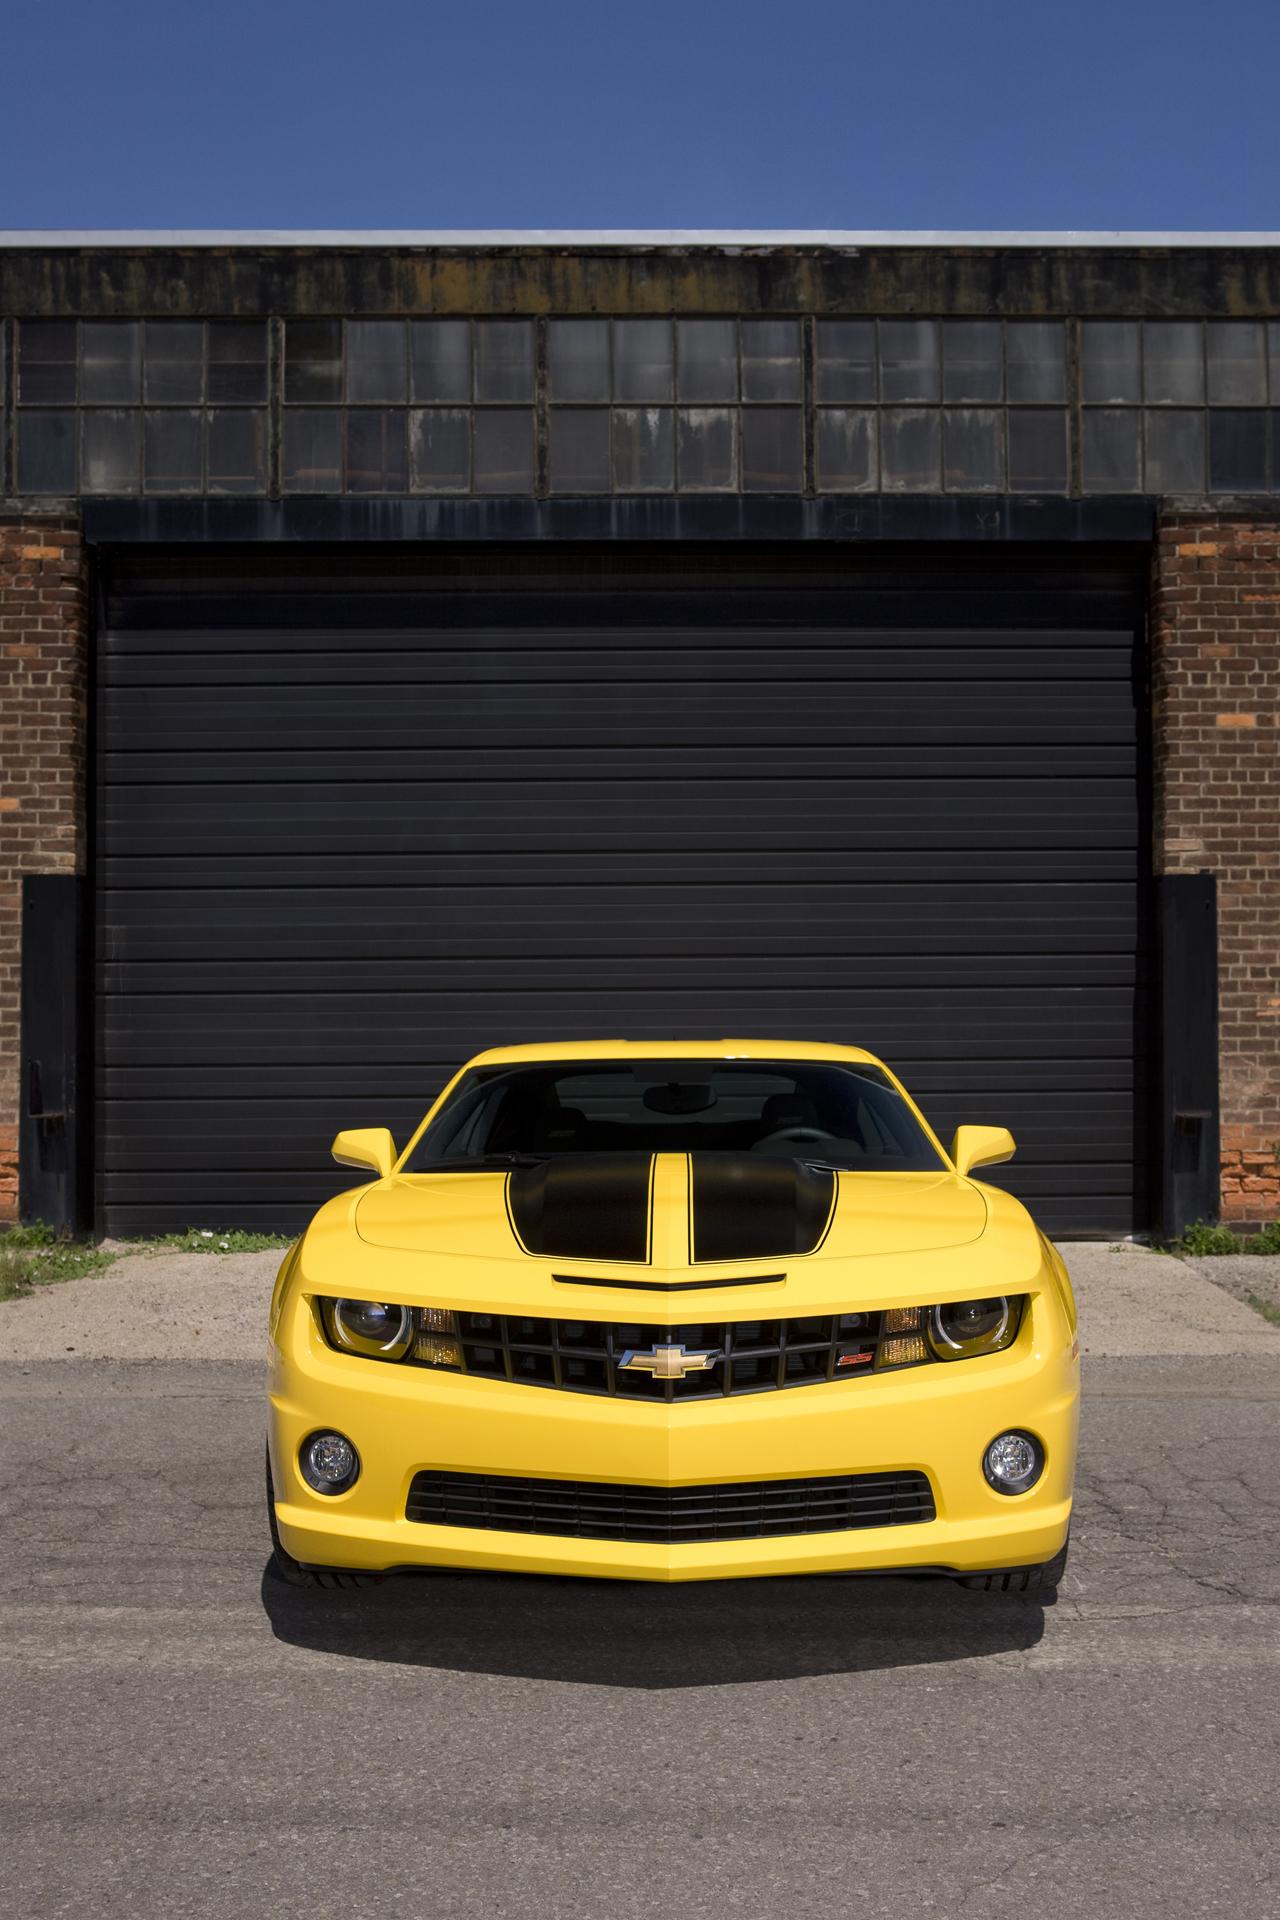 Chevrolet HD Desktop Wallpapers for